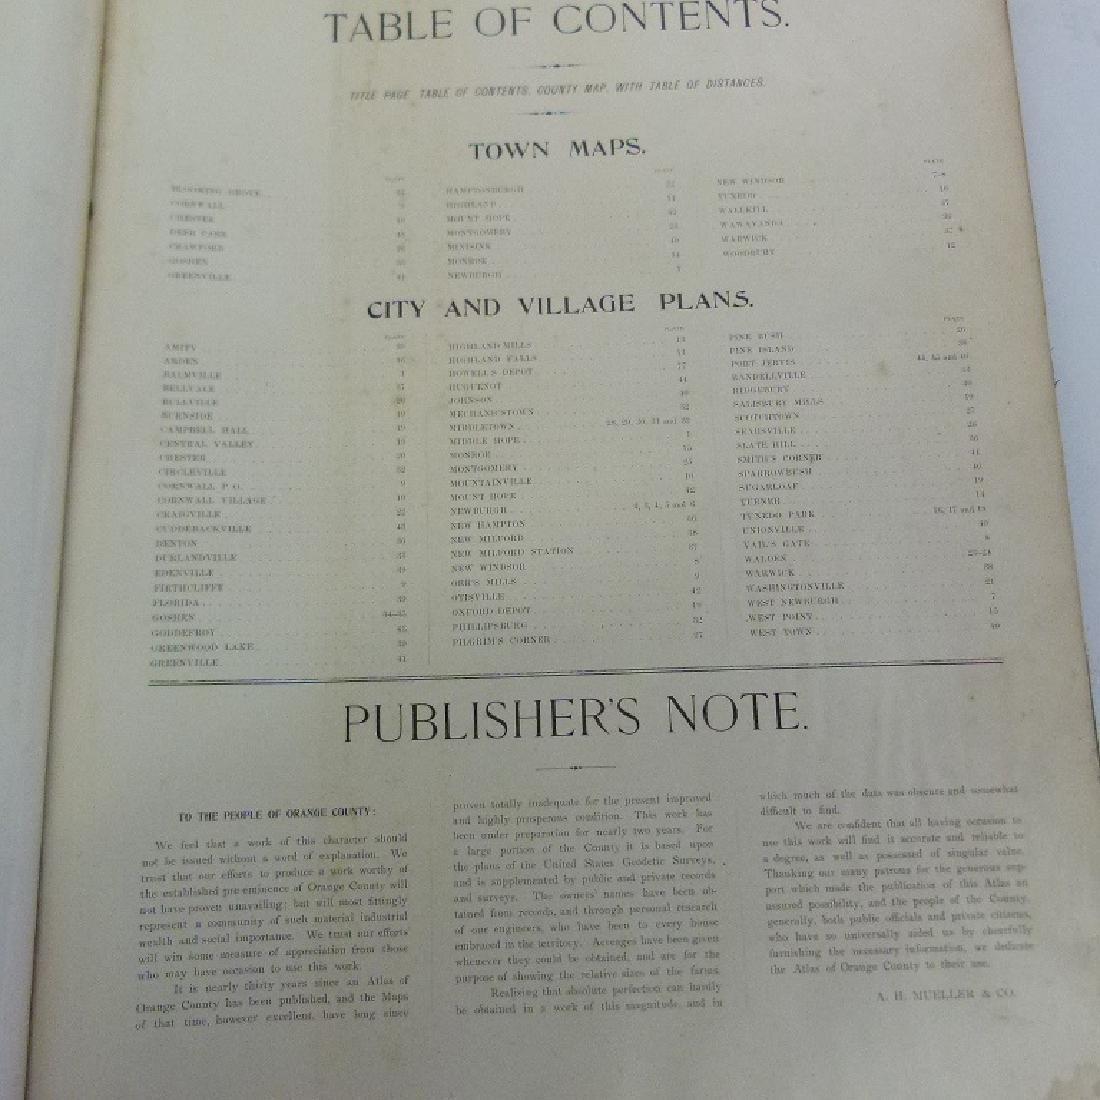 (2) ATLAS OF ORANGE COUNTY NY, A.H. MUELLER 1903 - 9